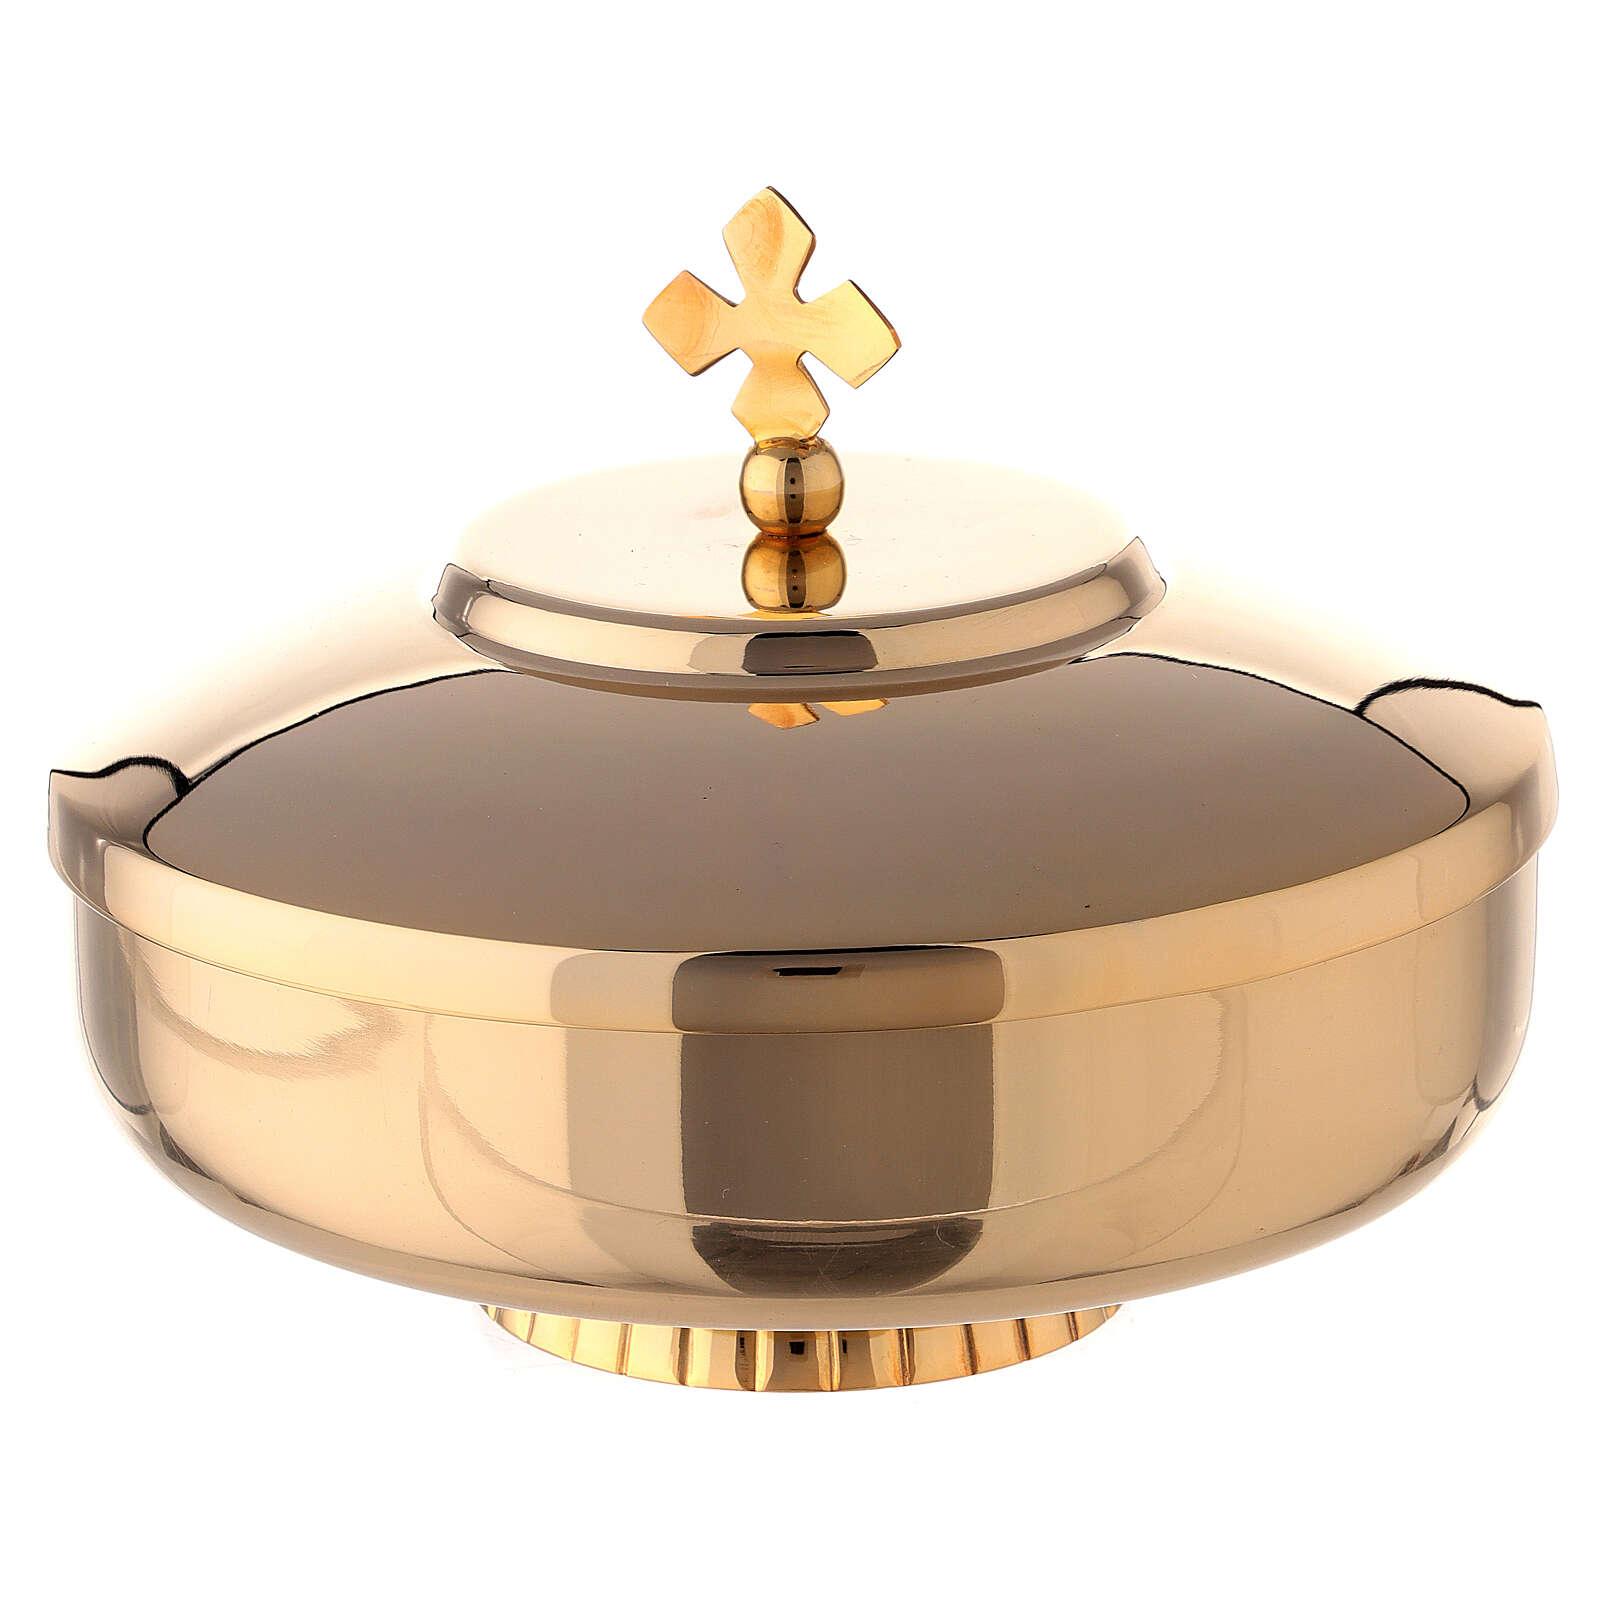 Open ciboria 6 in gold plated brass 4